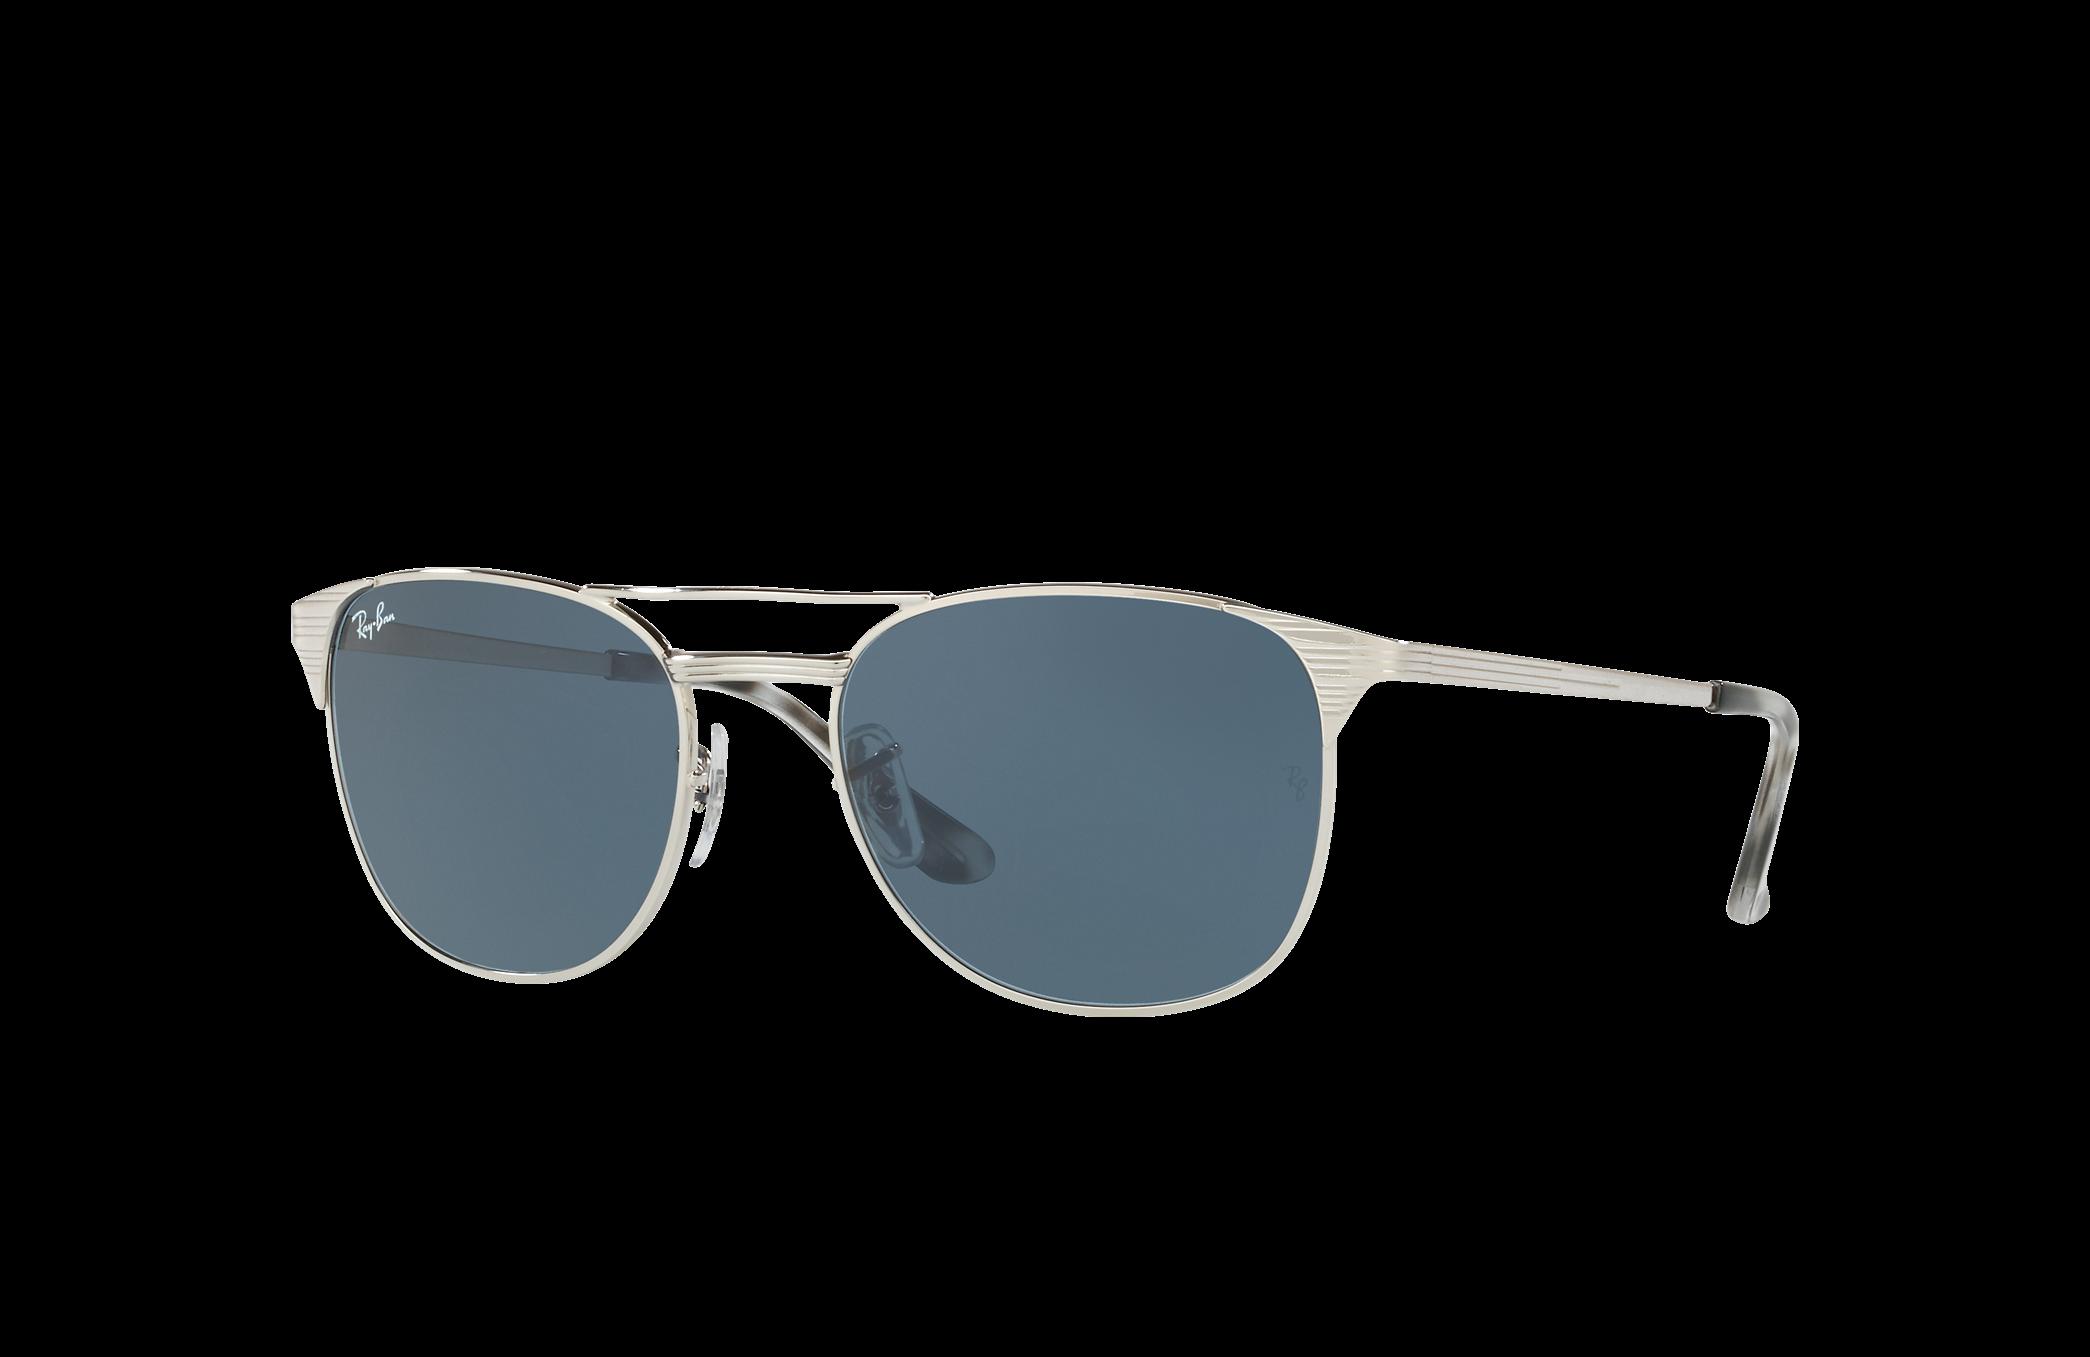 Ray-Ban Signet Silver, Blue Lenses - RB3429M